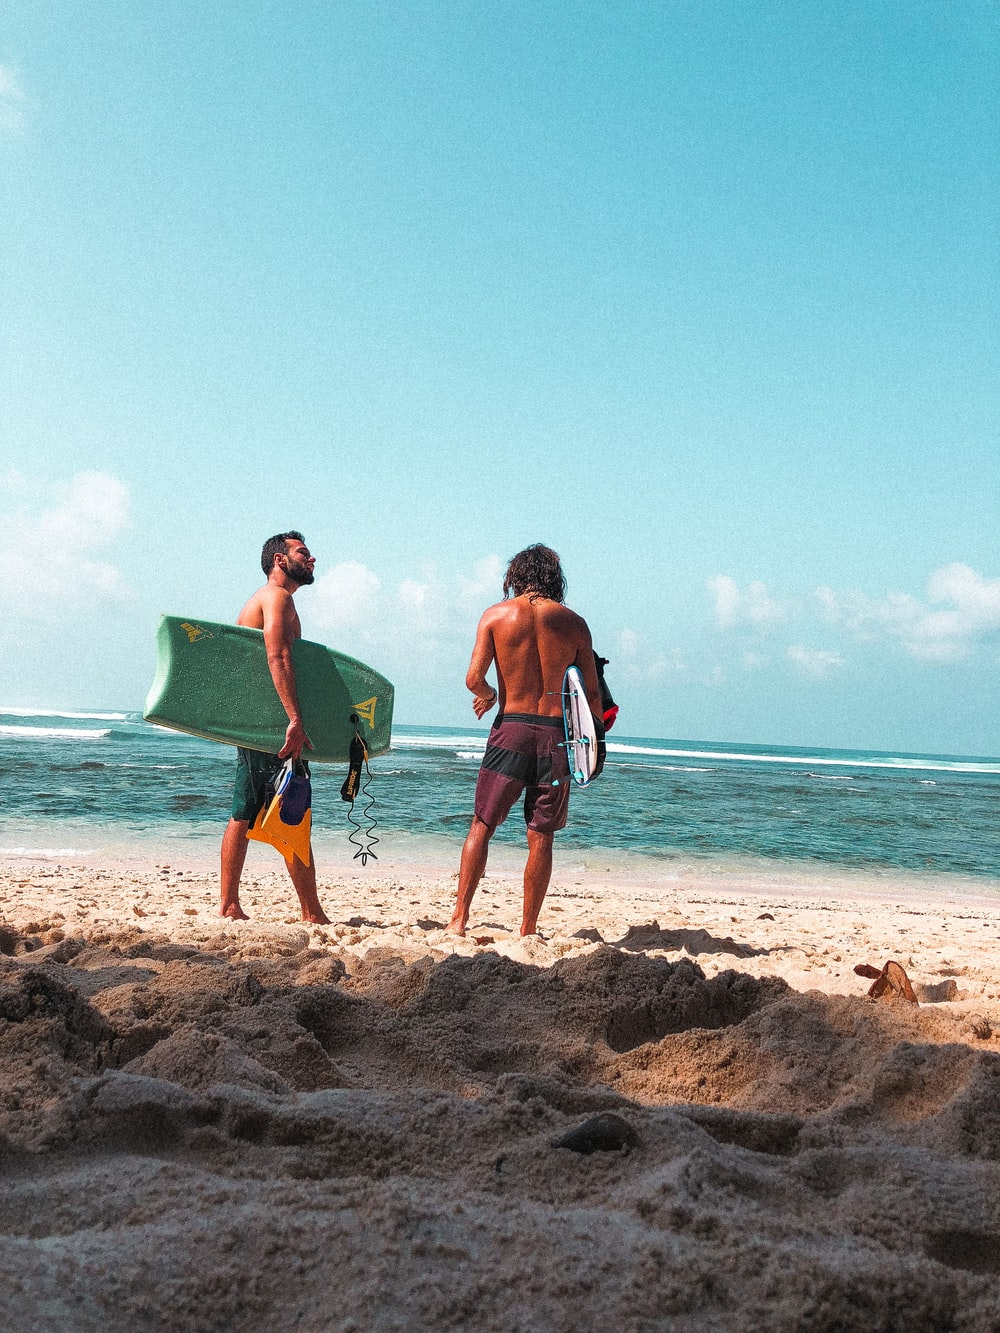 2 men and 2 women running on beach during daytime